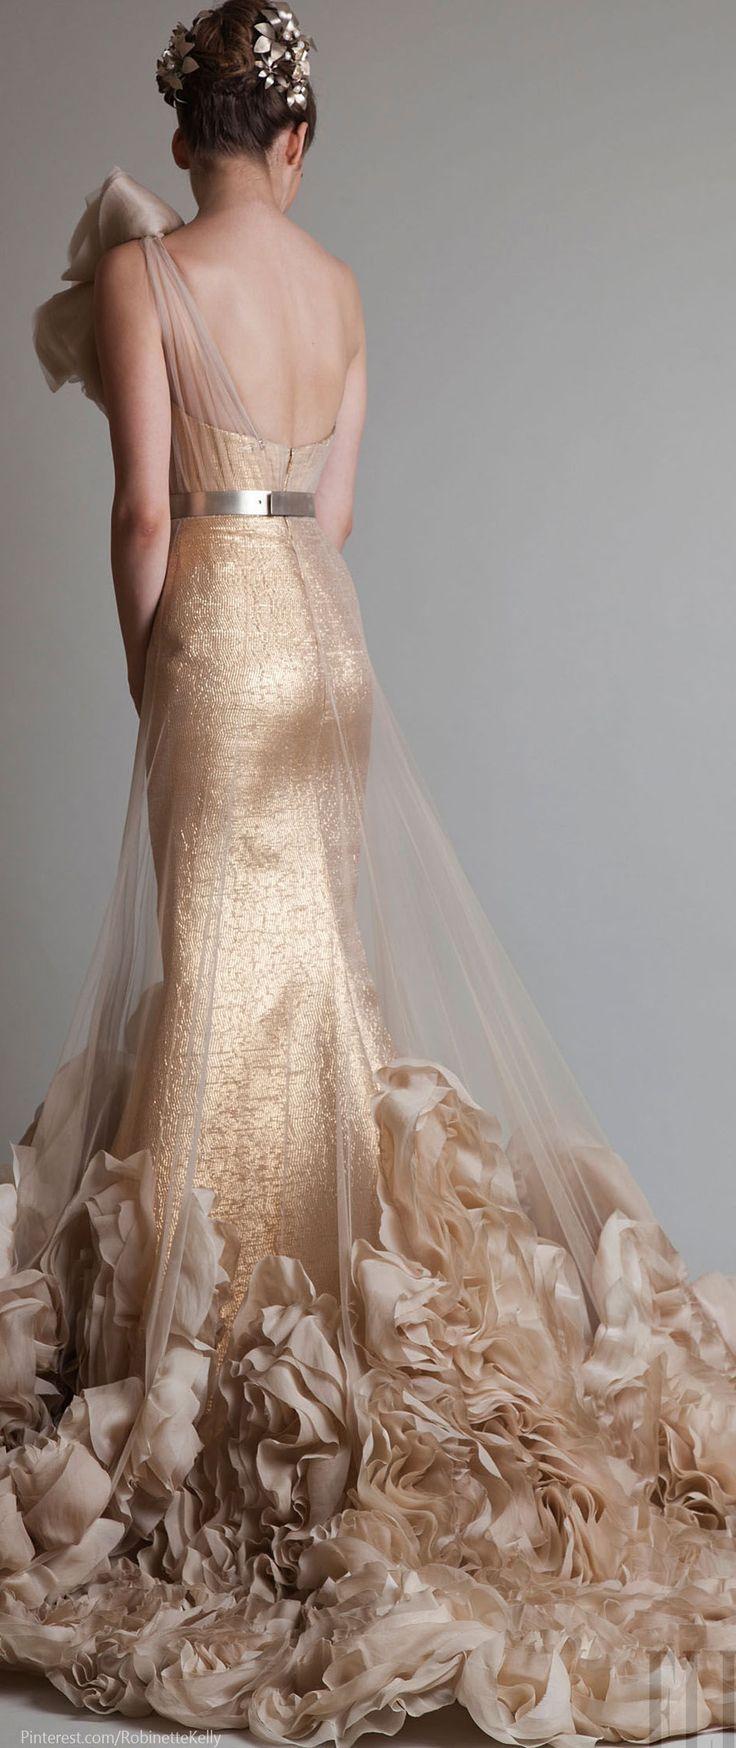 Krikor Jabotian Couture | 2014 http://notordinaryfashion.tumblr.com/post/56863882946/bemyguestdesign-krikor-jabotian-couture